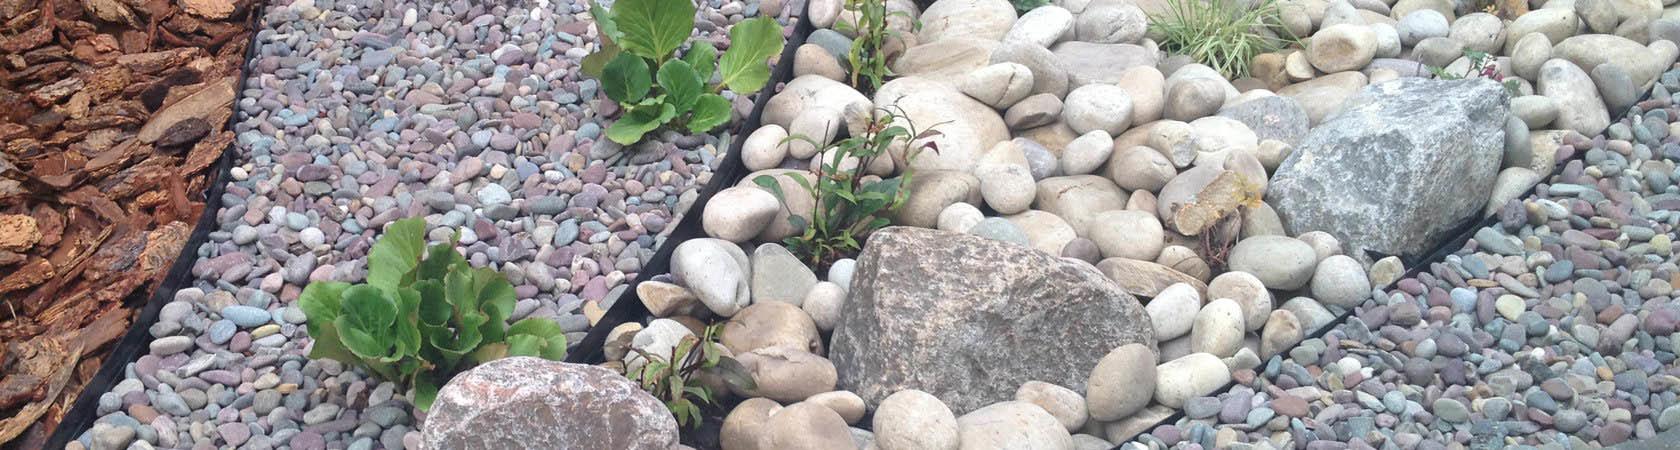 Decorative stone pebbles garden design Palmerston North